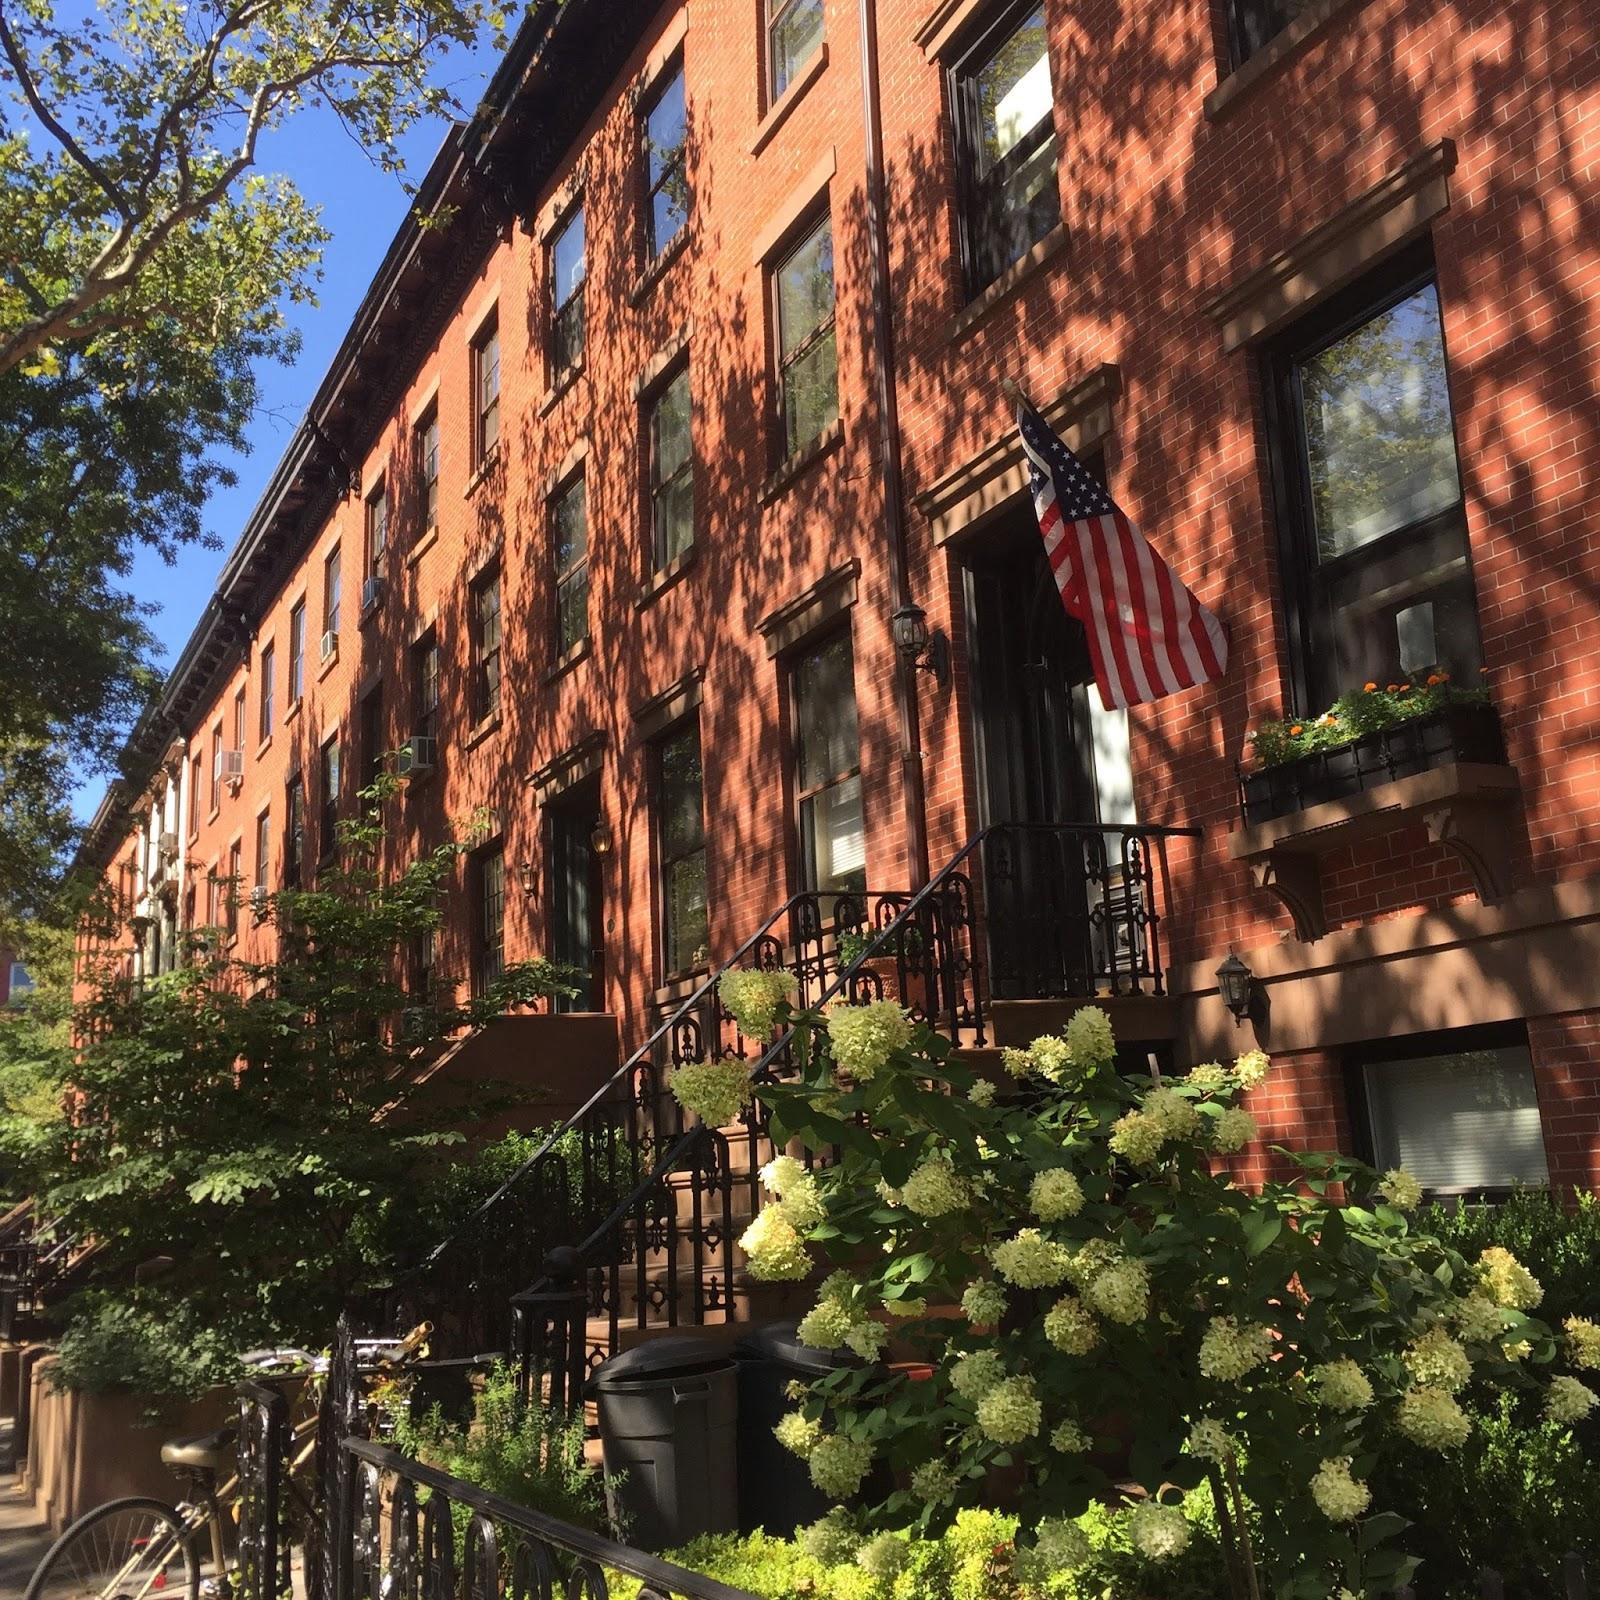 boston blogger summer, brooklyn brown stones, bos blogger in brooklyn, brooklyn blog post